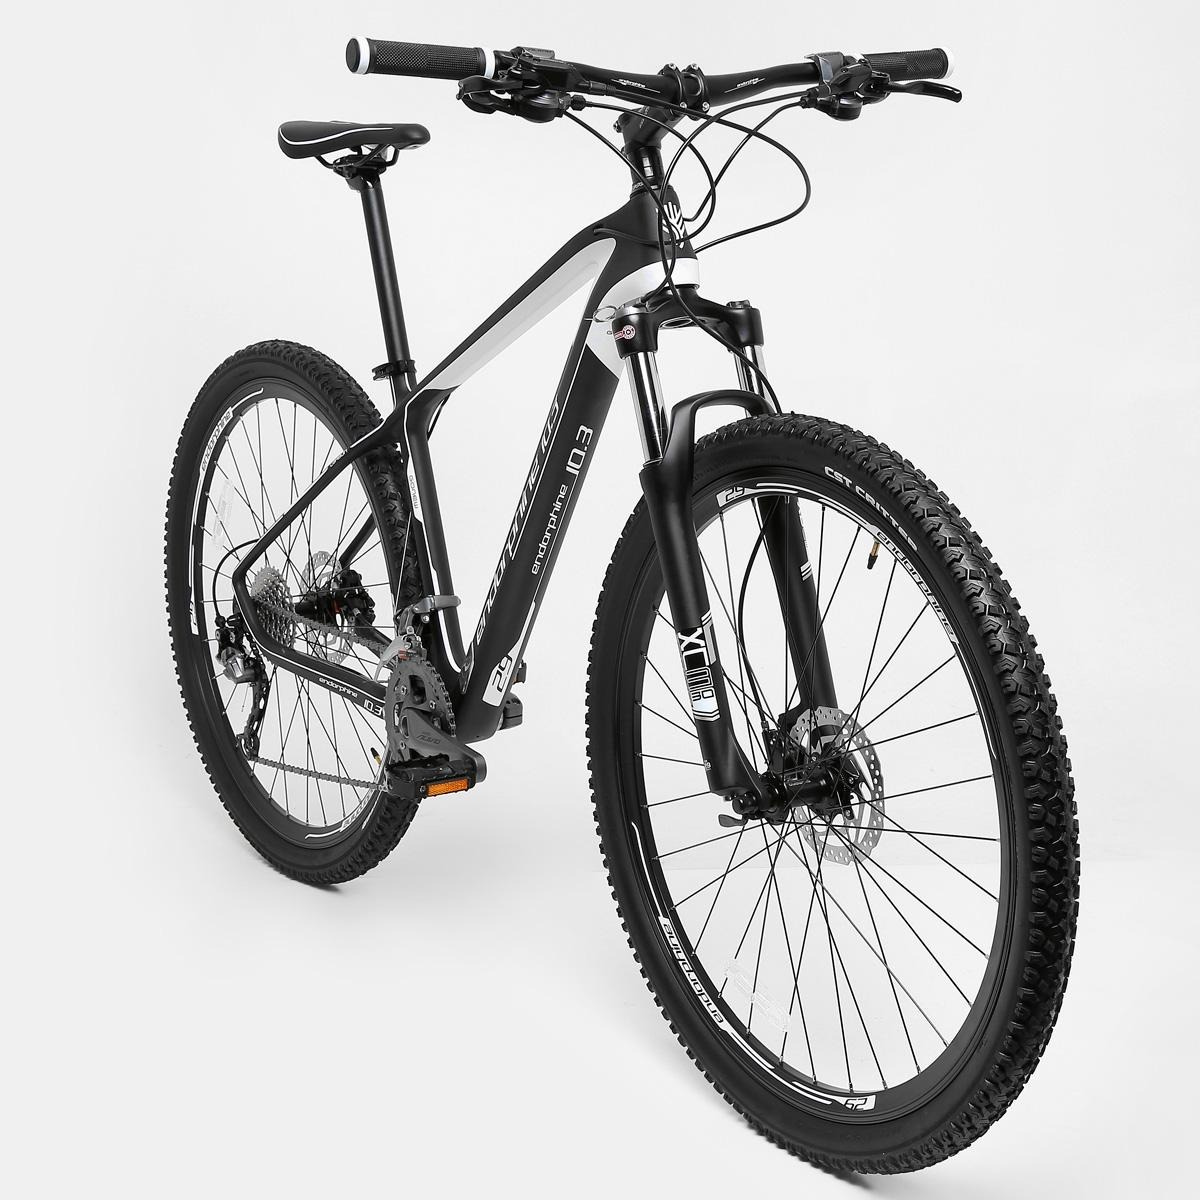 cdb5f807c bicicleta gonew endorphine 10.3 shimano aro 29. Carregando zoom.